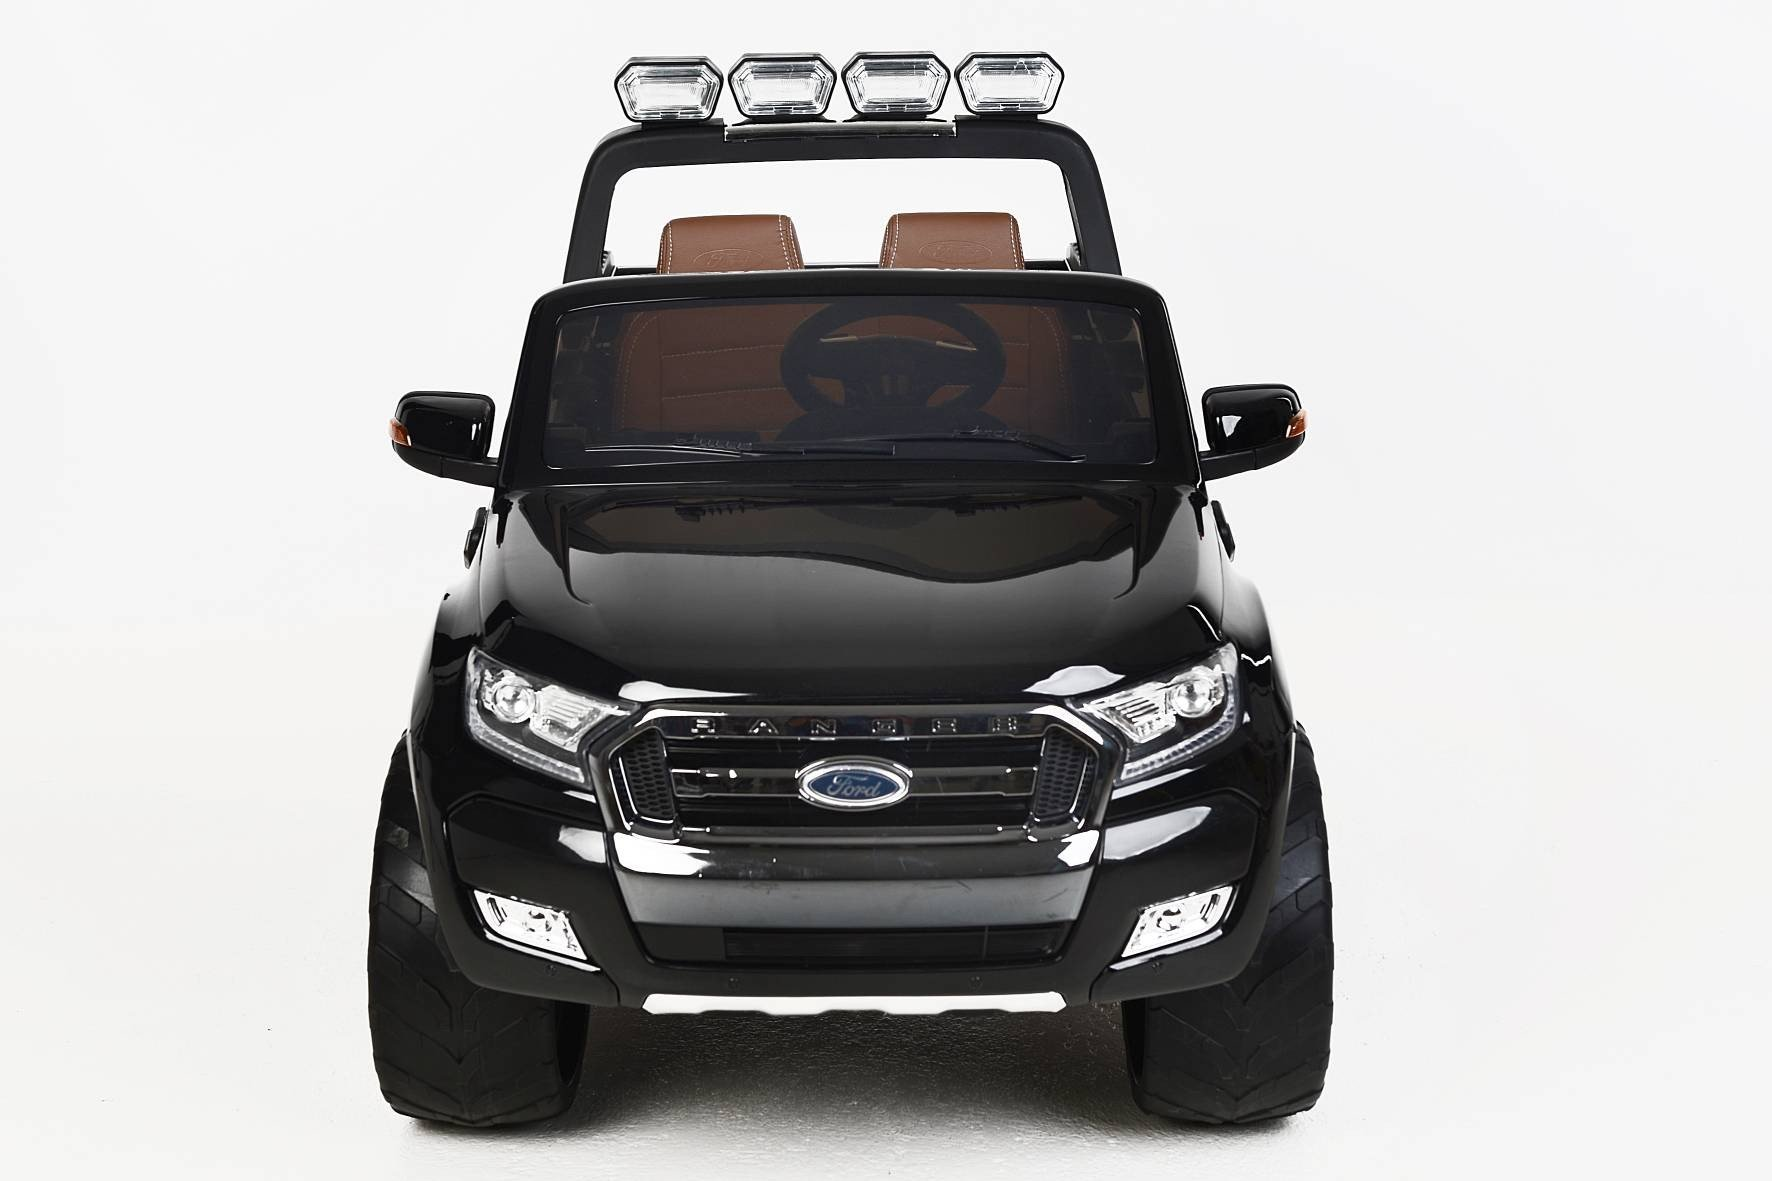 Todoterreno electrico infantil Ford Ranger MP4 Negro Metalizado con apertura de puertas